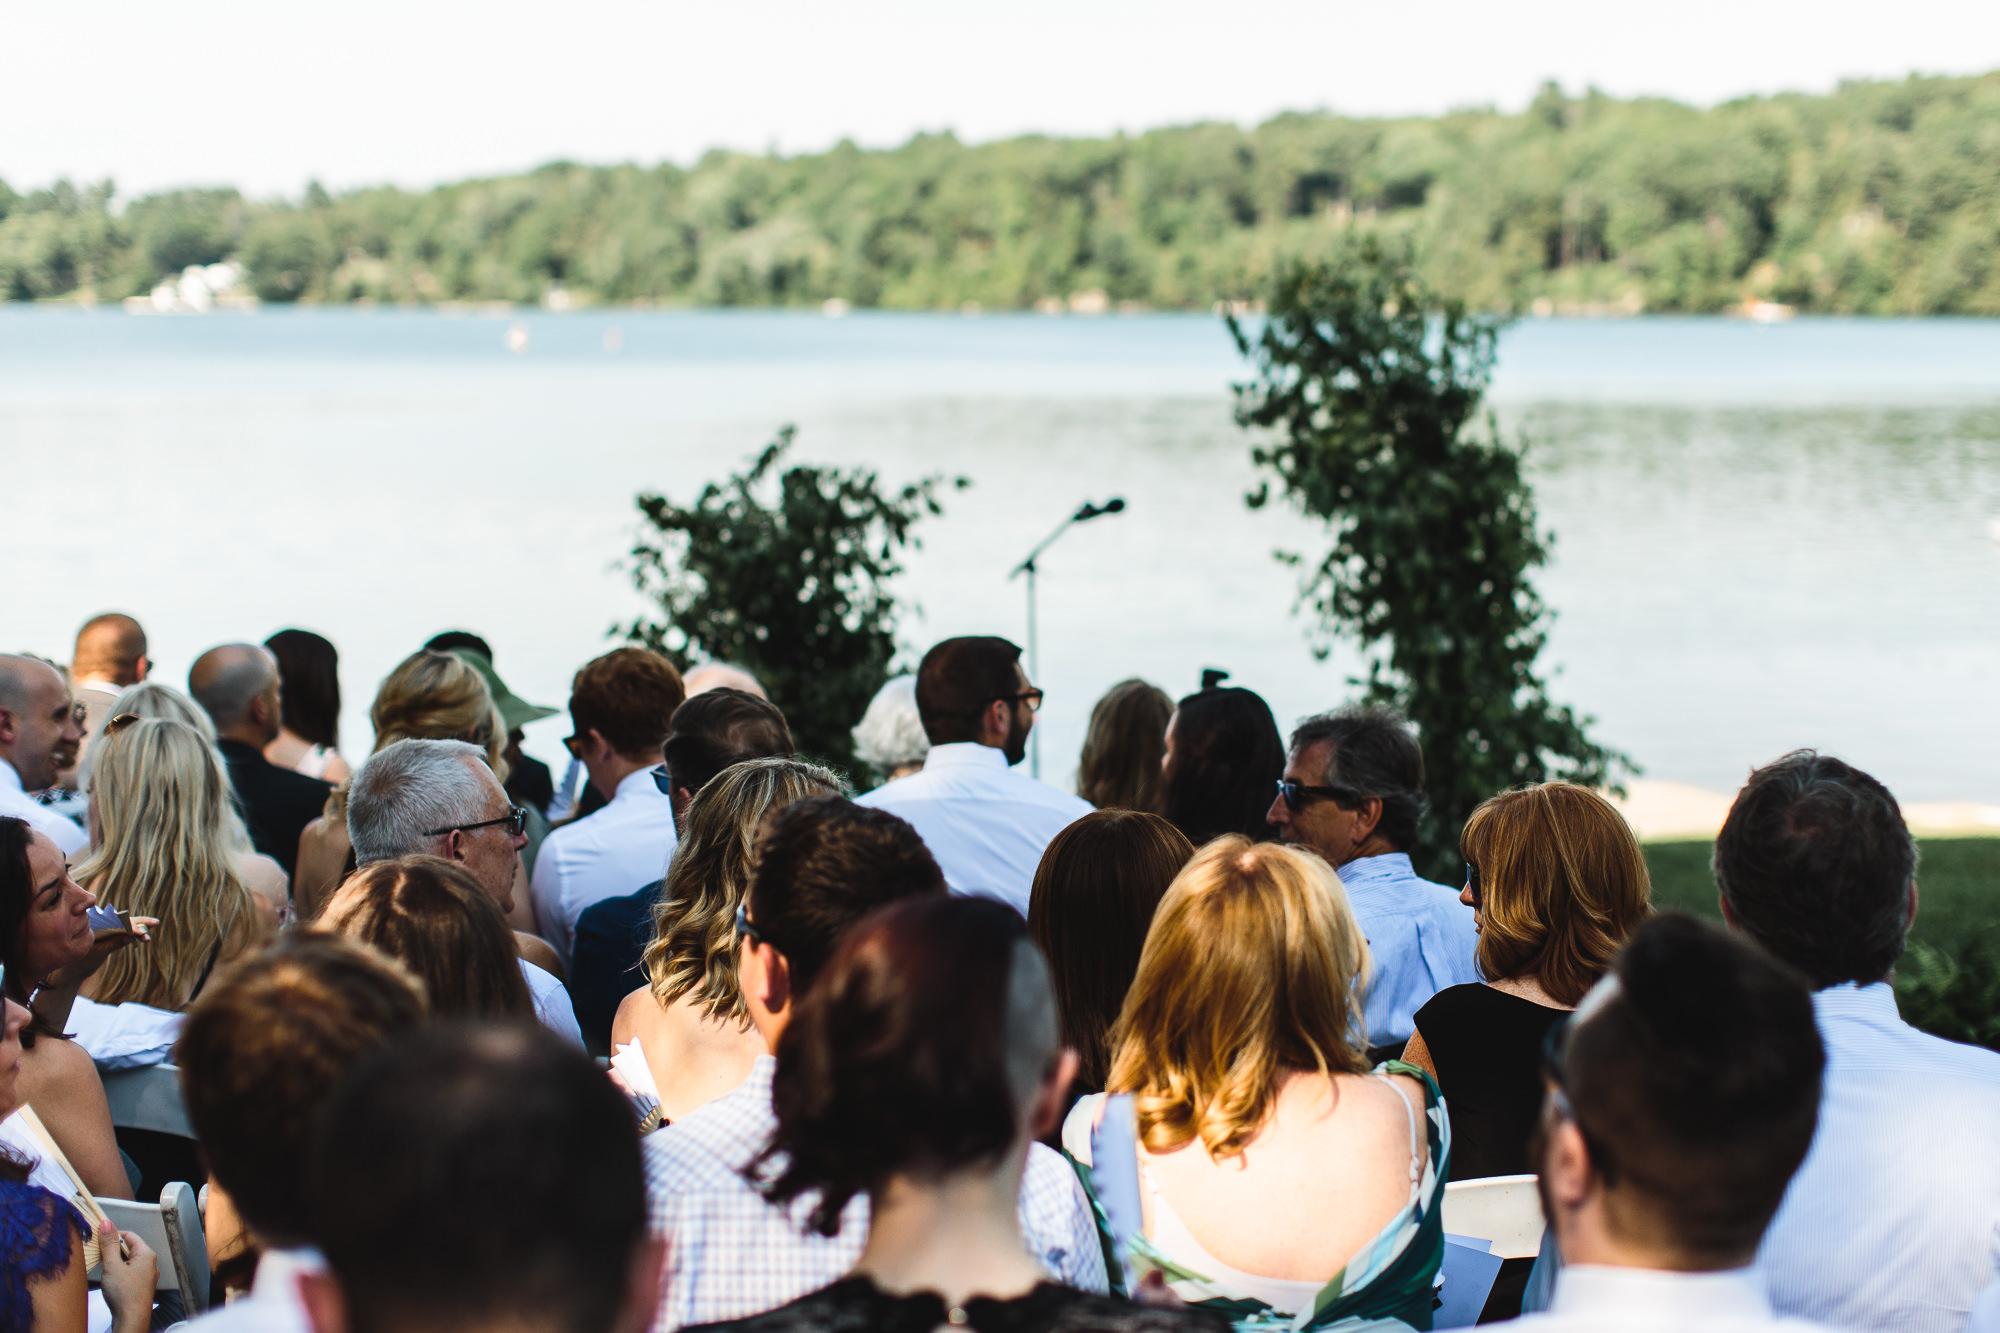 connecticut-summer-lake-wedding-emily-kirke-photography-upstyle (77 of 181).jpg